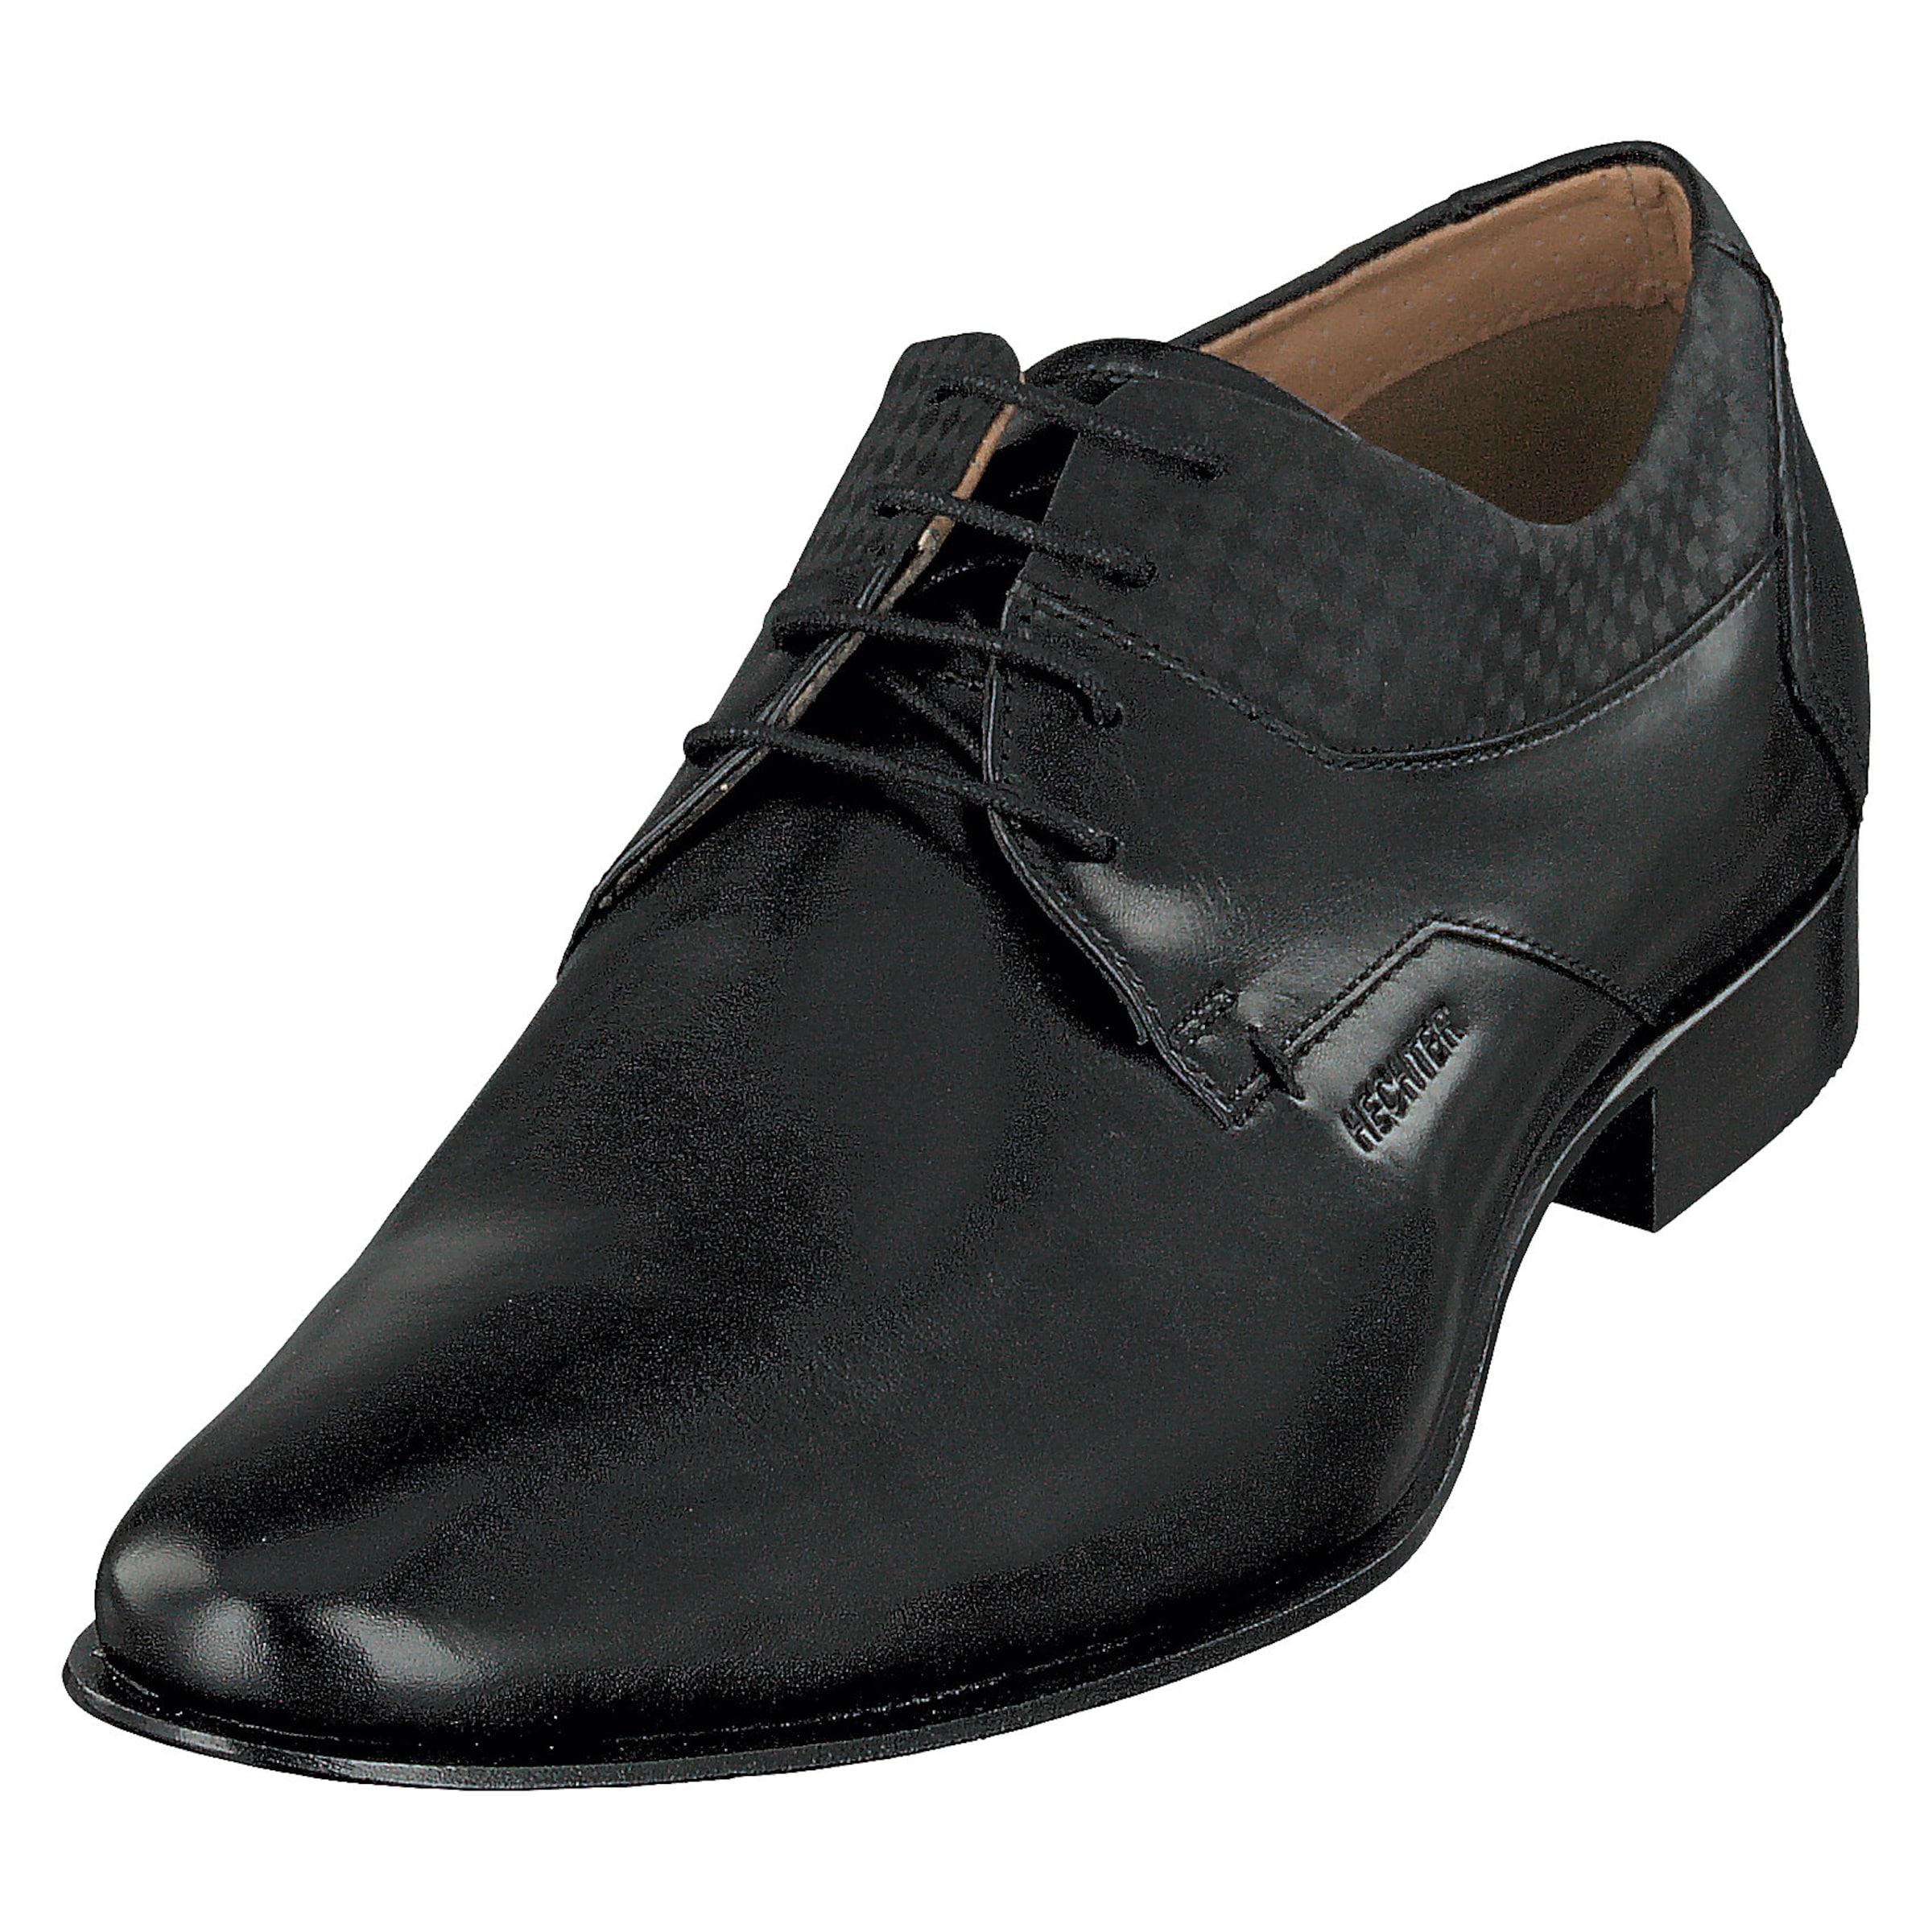 DANIEL HECHTER Business-Schnürschuhe Verschleißfeste billige Schuhe